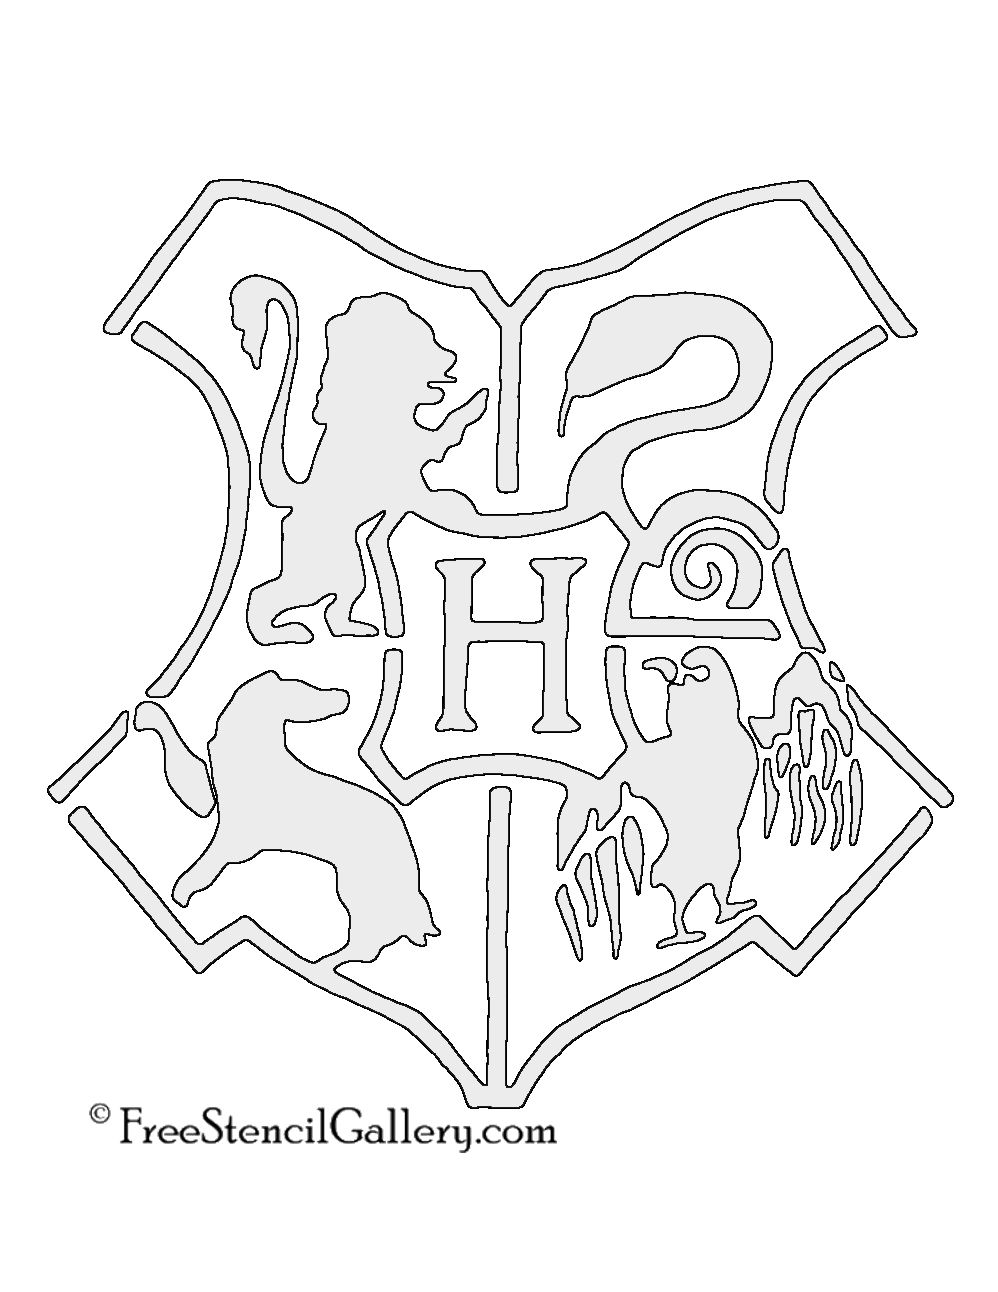 Hogwarts Logo Drawing : hogwarts, drawing, Hogwarts, Crest, Stencil, Harry, Potter, Stencils,, Pumpkin, Carving,